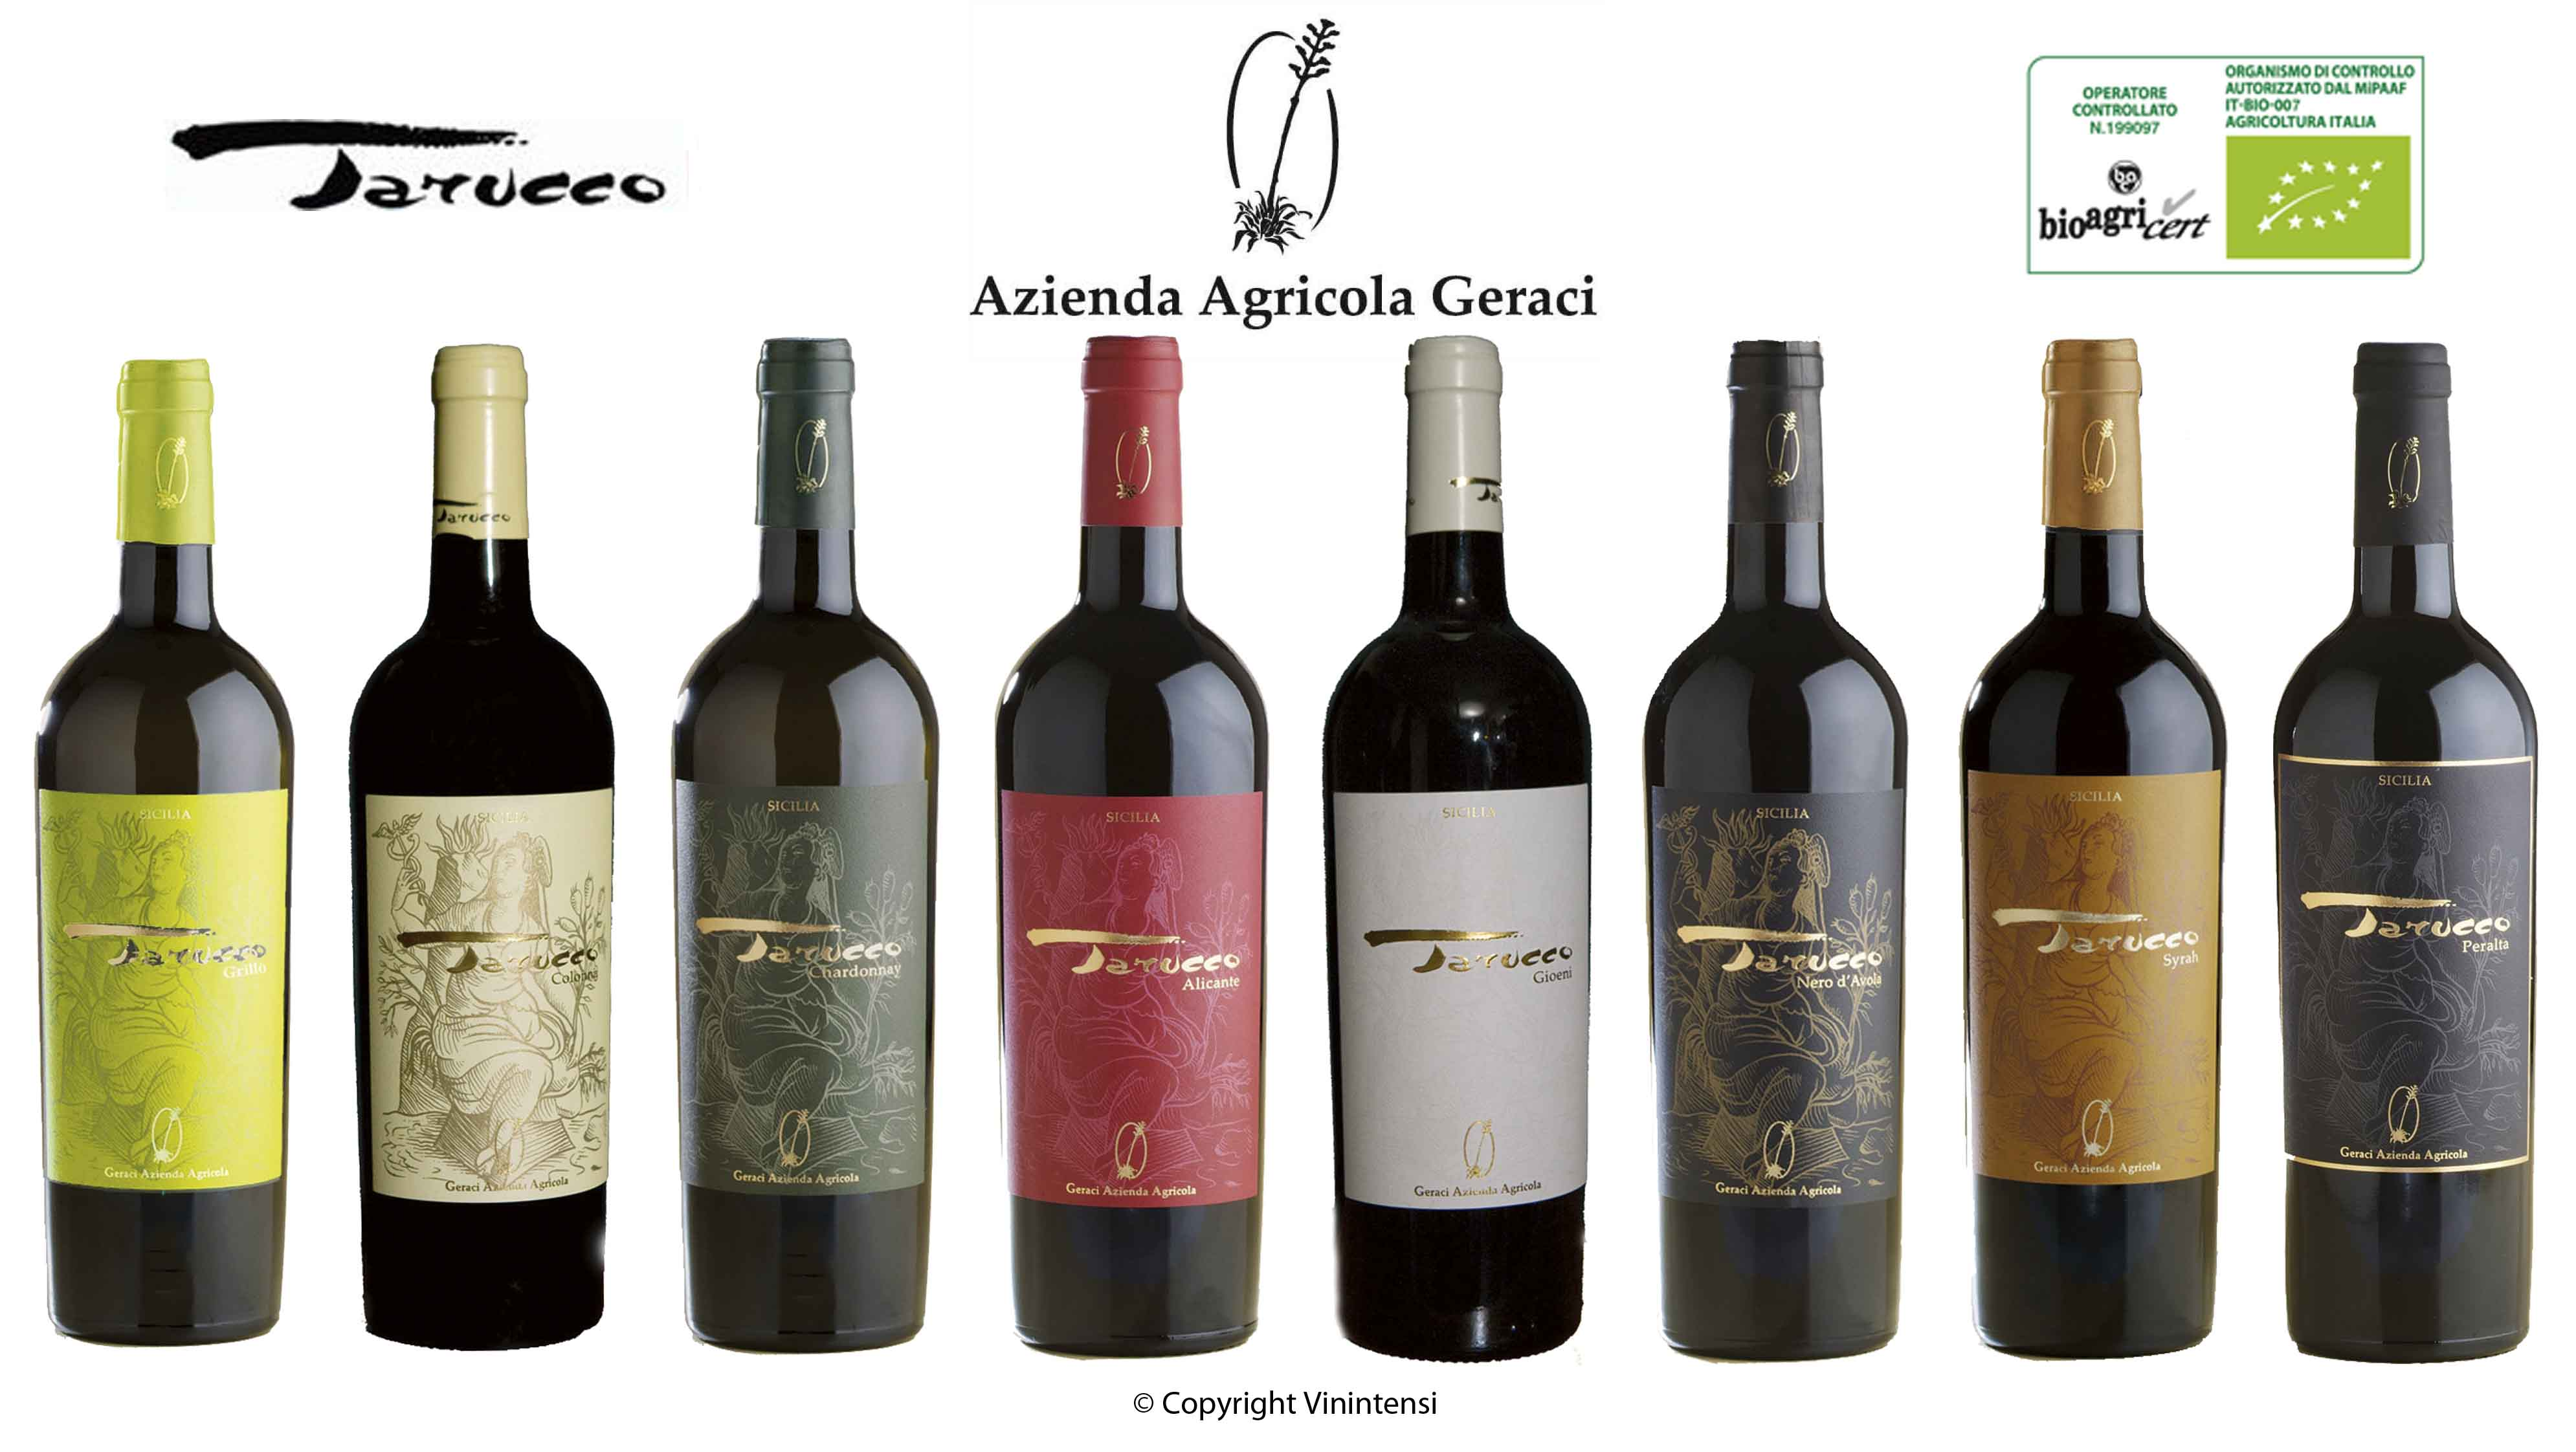 Vini Tarucco fond blanc avec logo XLR